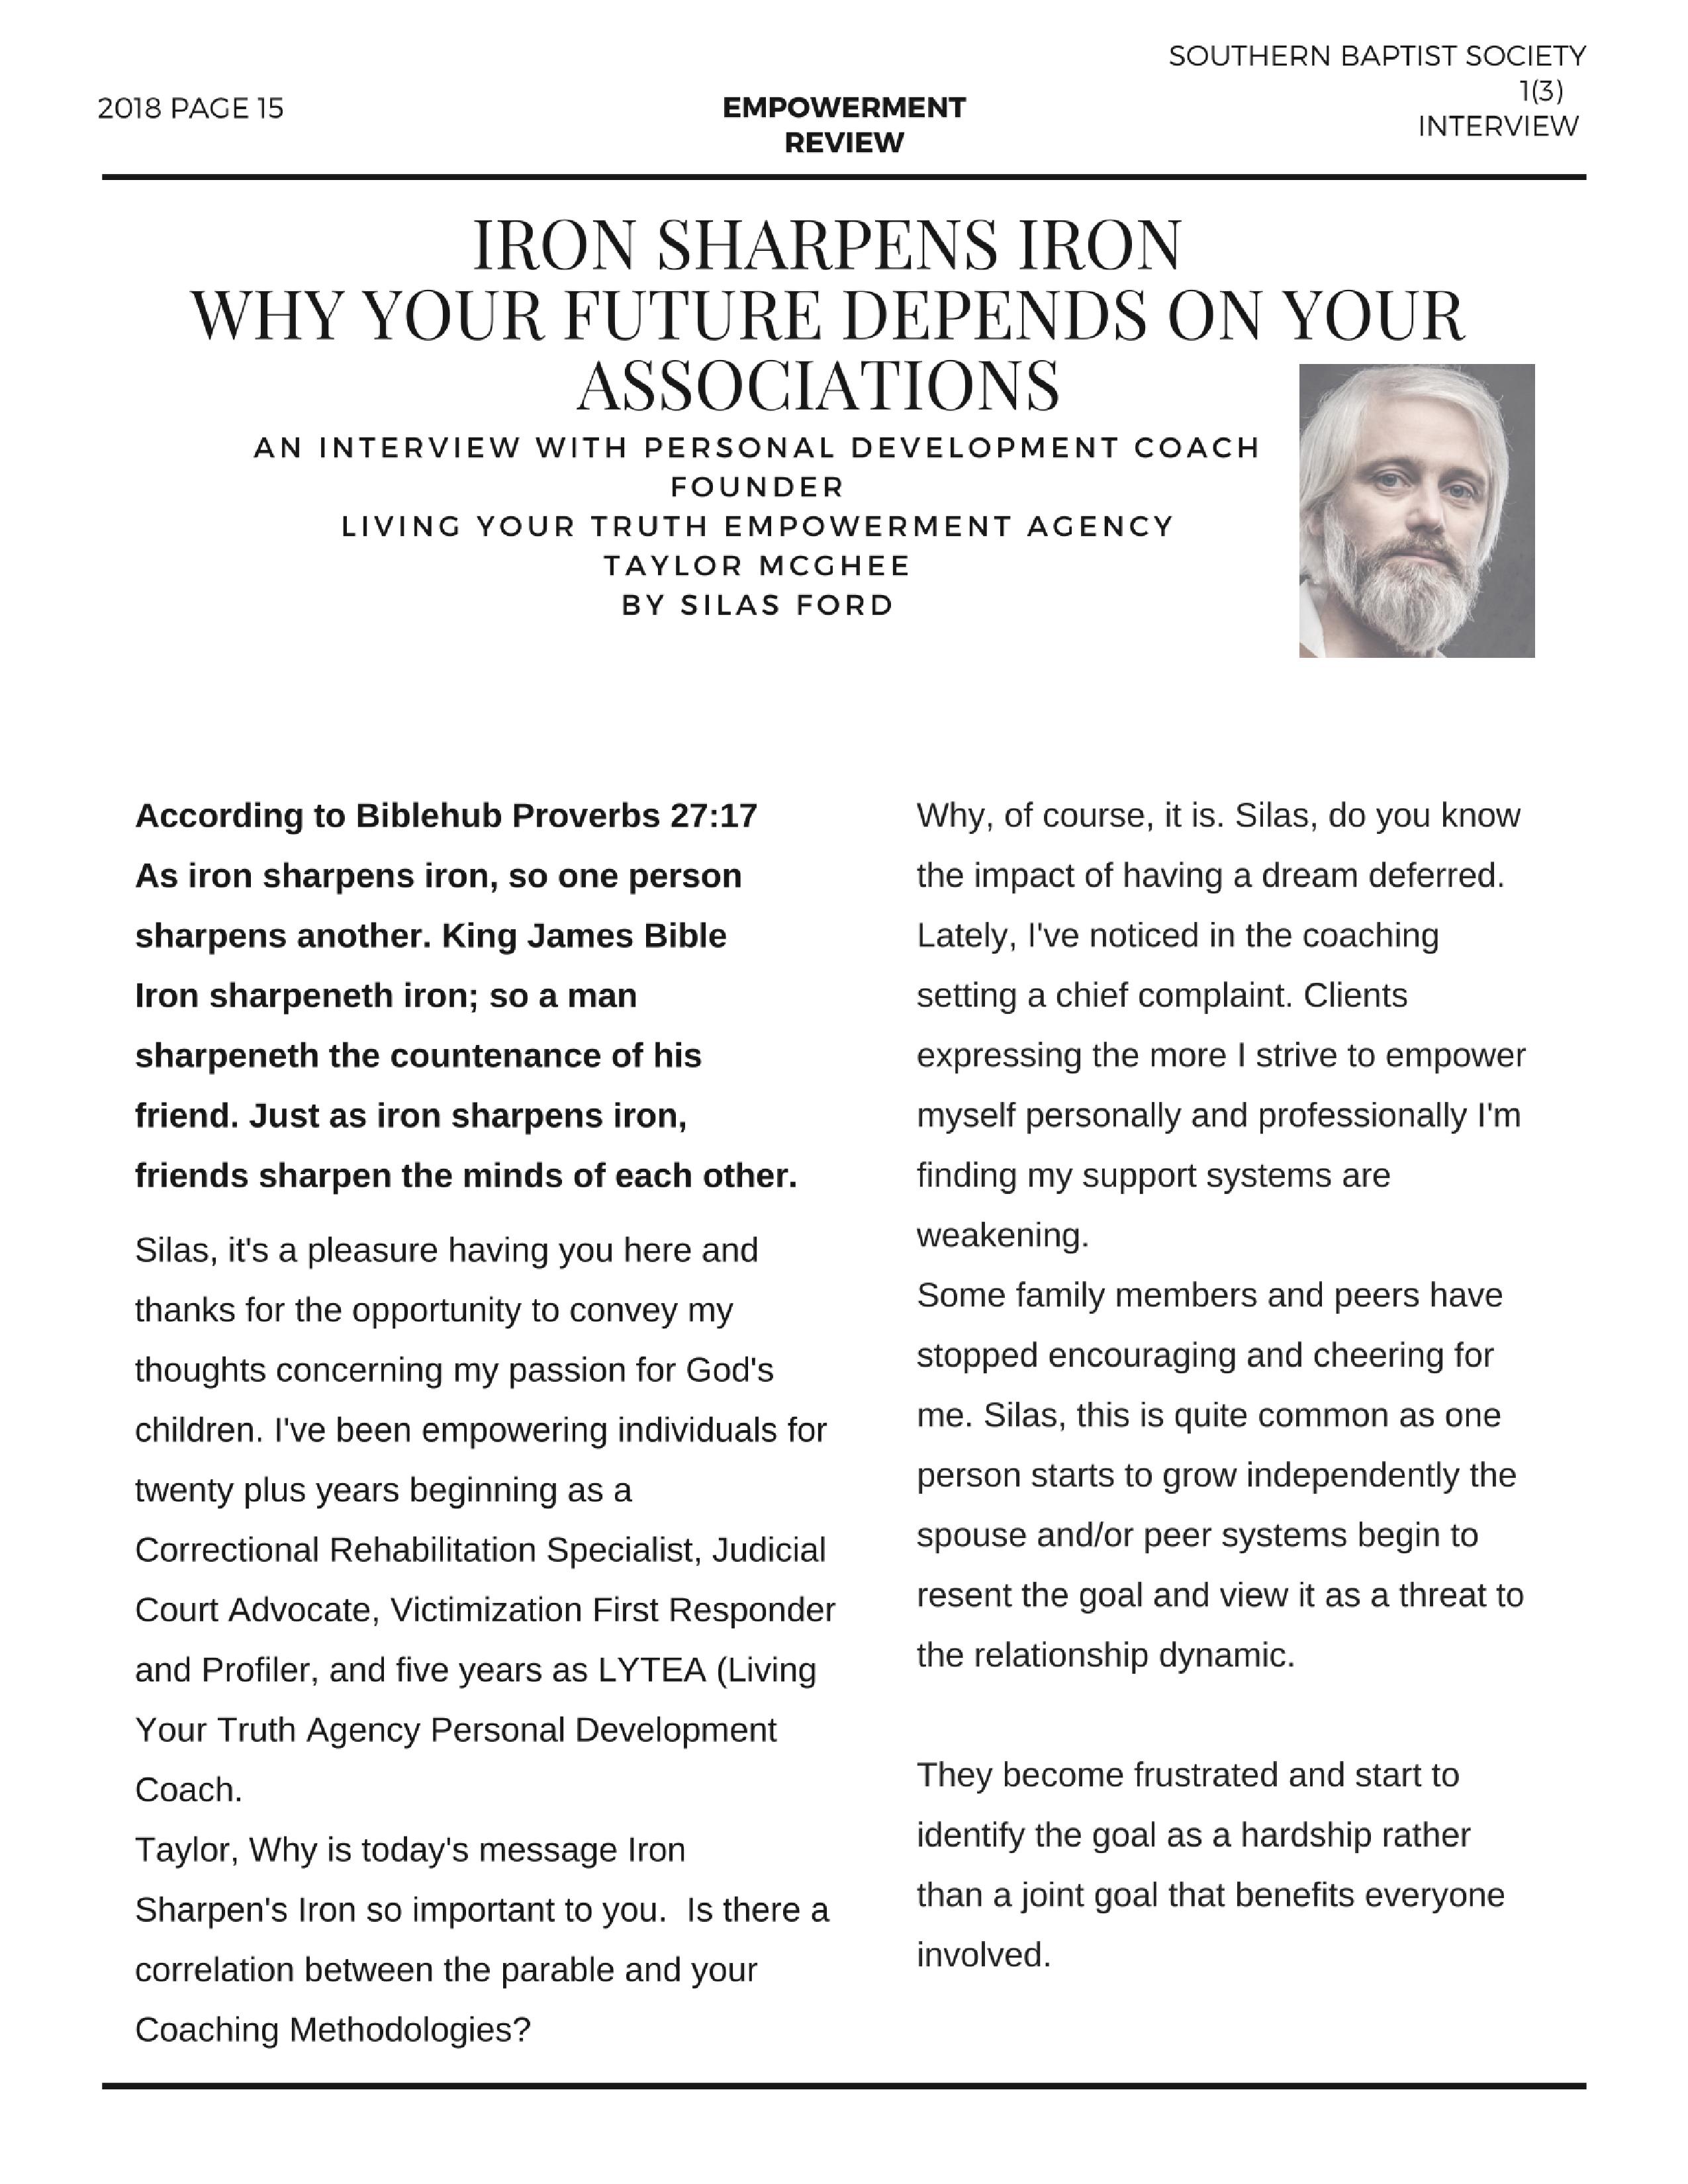 Magazine empowerment review pg 1